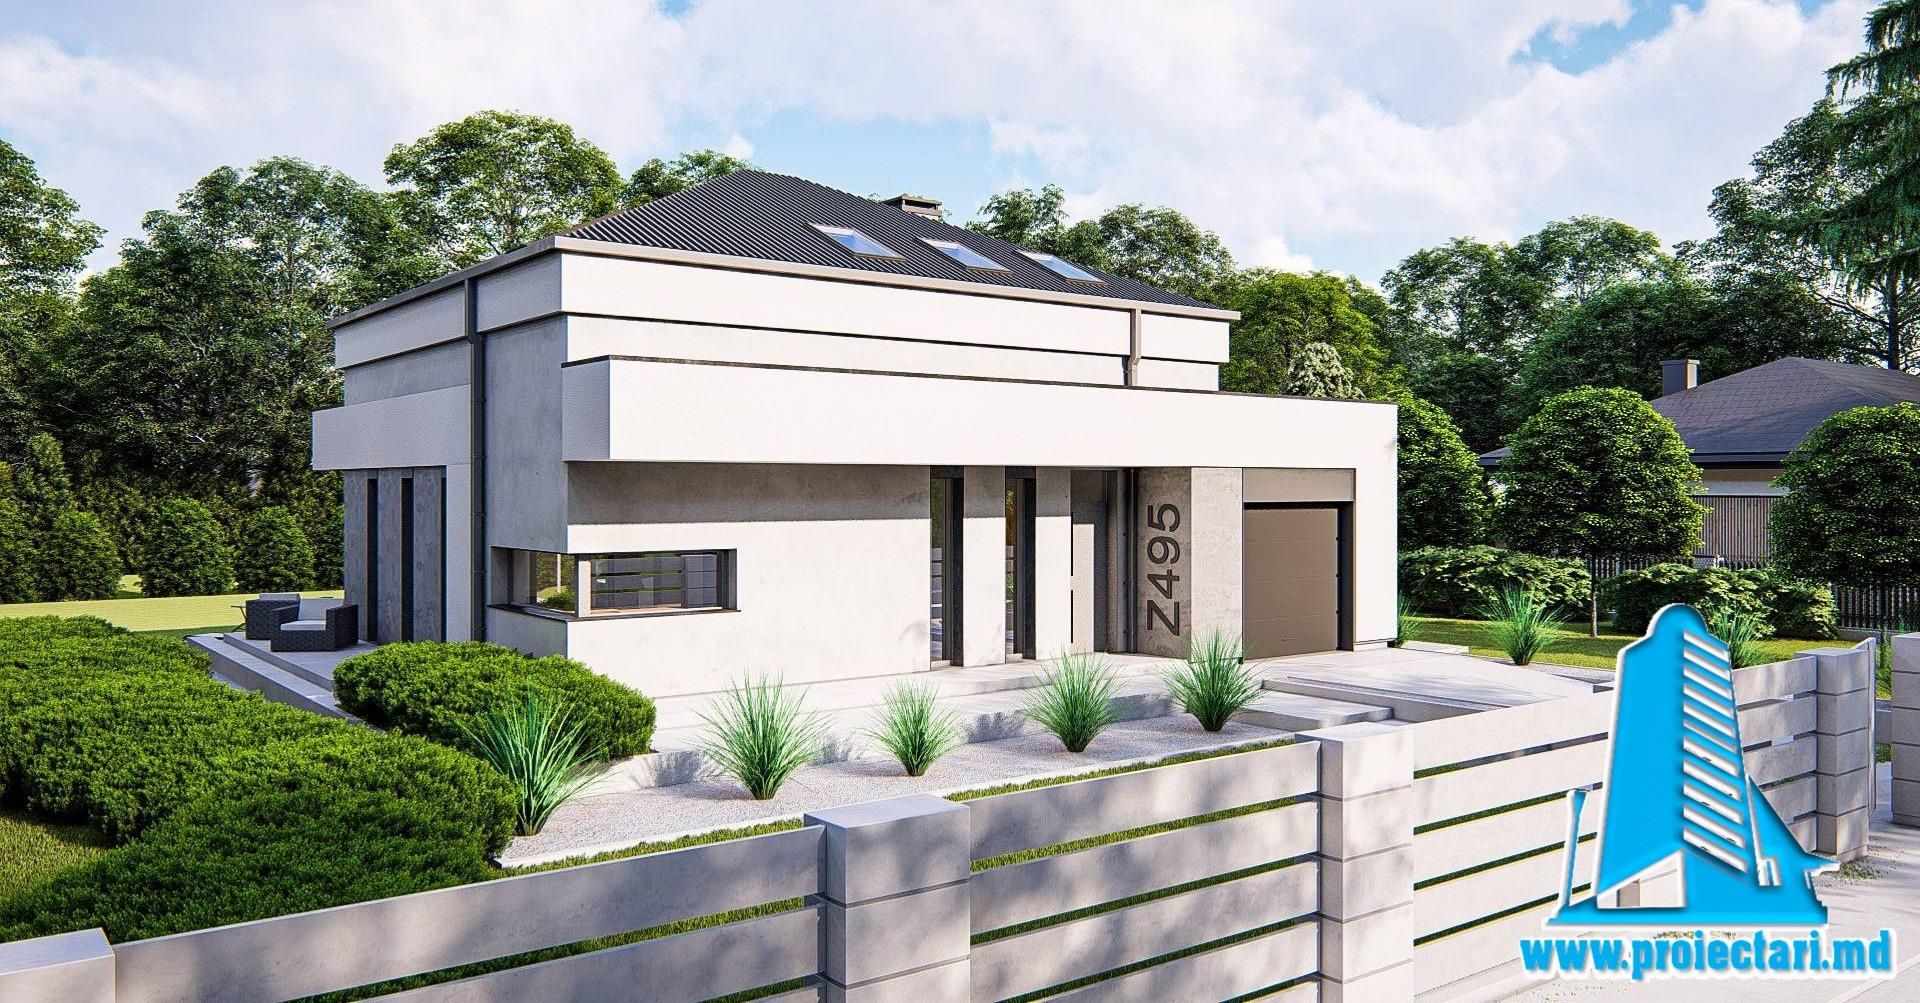 Proiect Casa cu mansarda, garaj si piscina 200m2  – 101083